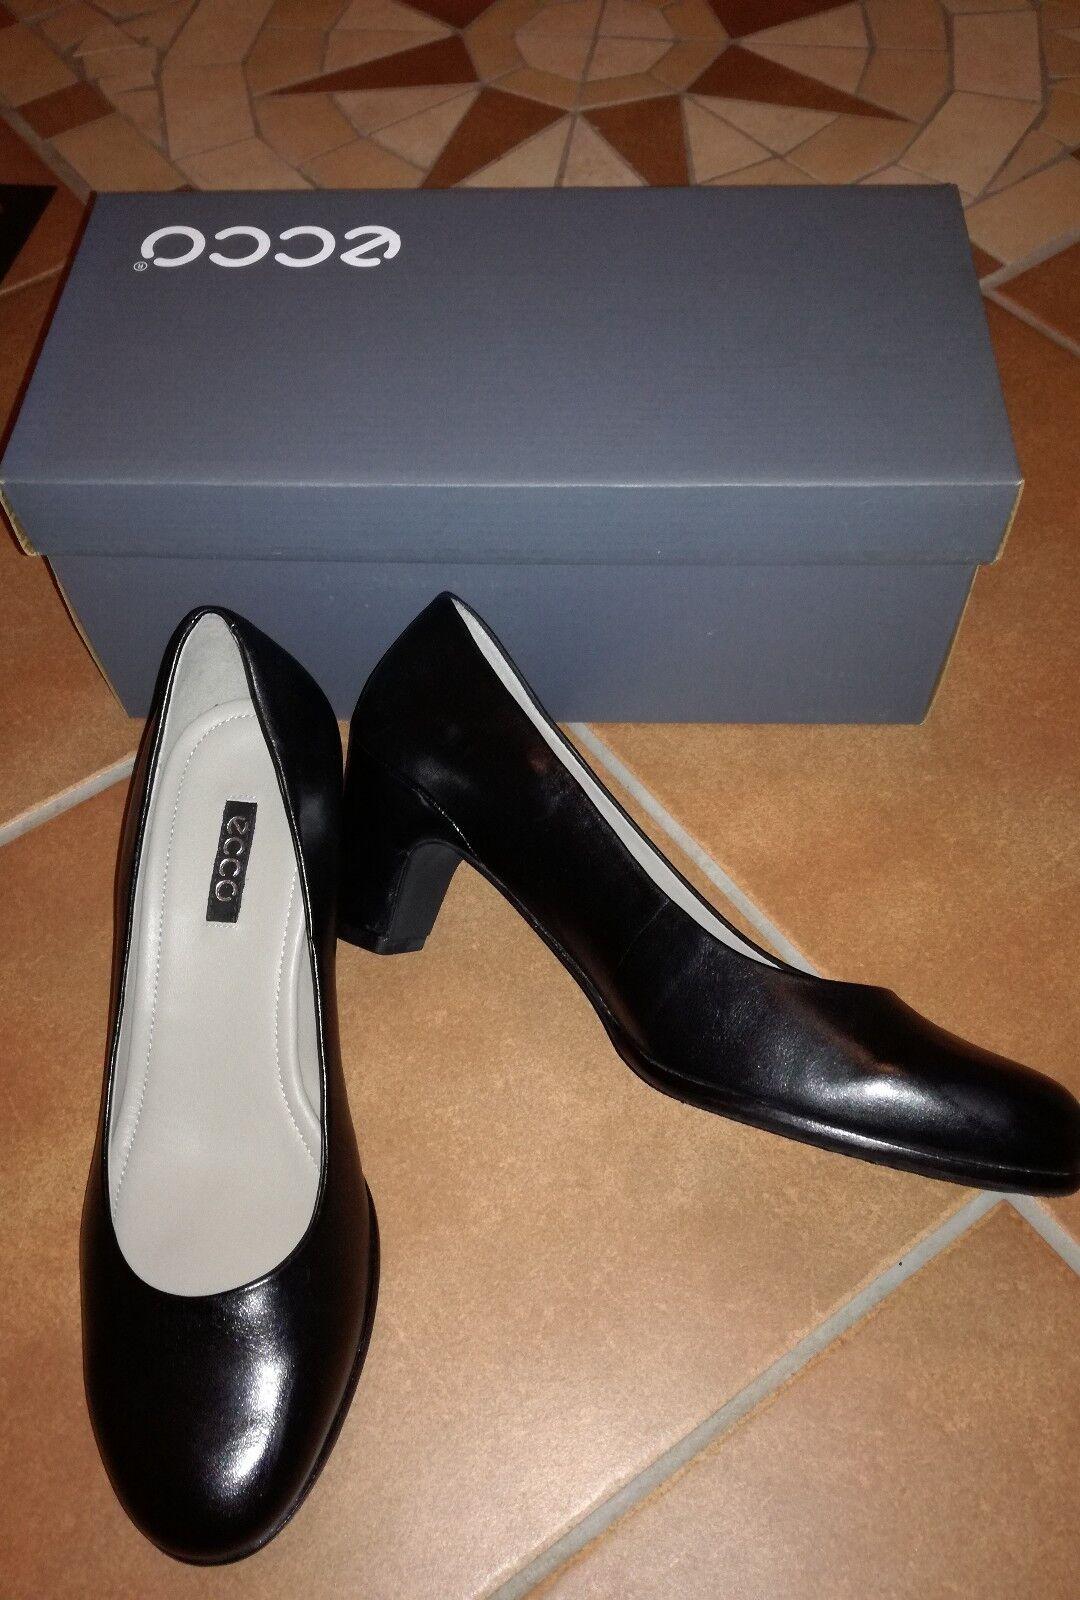 Ecco neu Pumps Schuhe Gr.38 Schwarz wie neu Ecco 904583